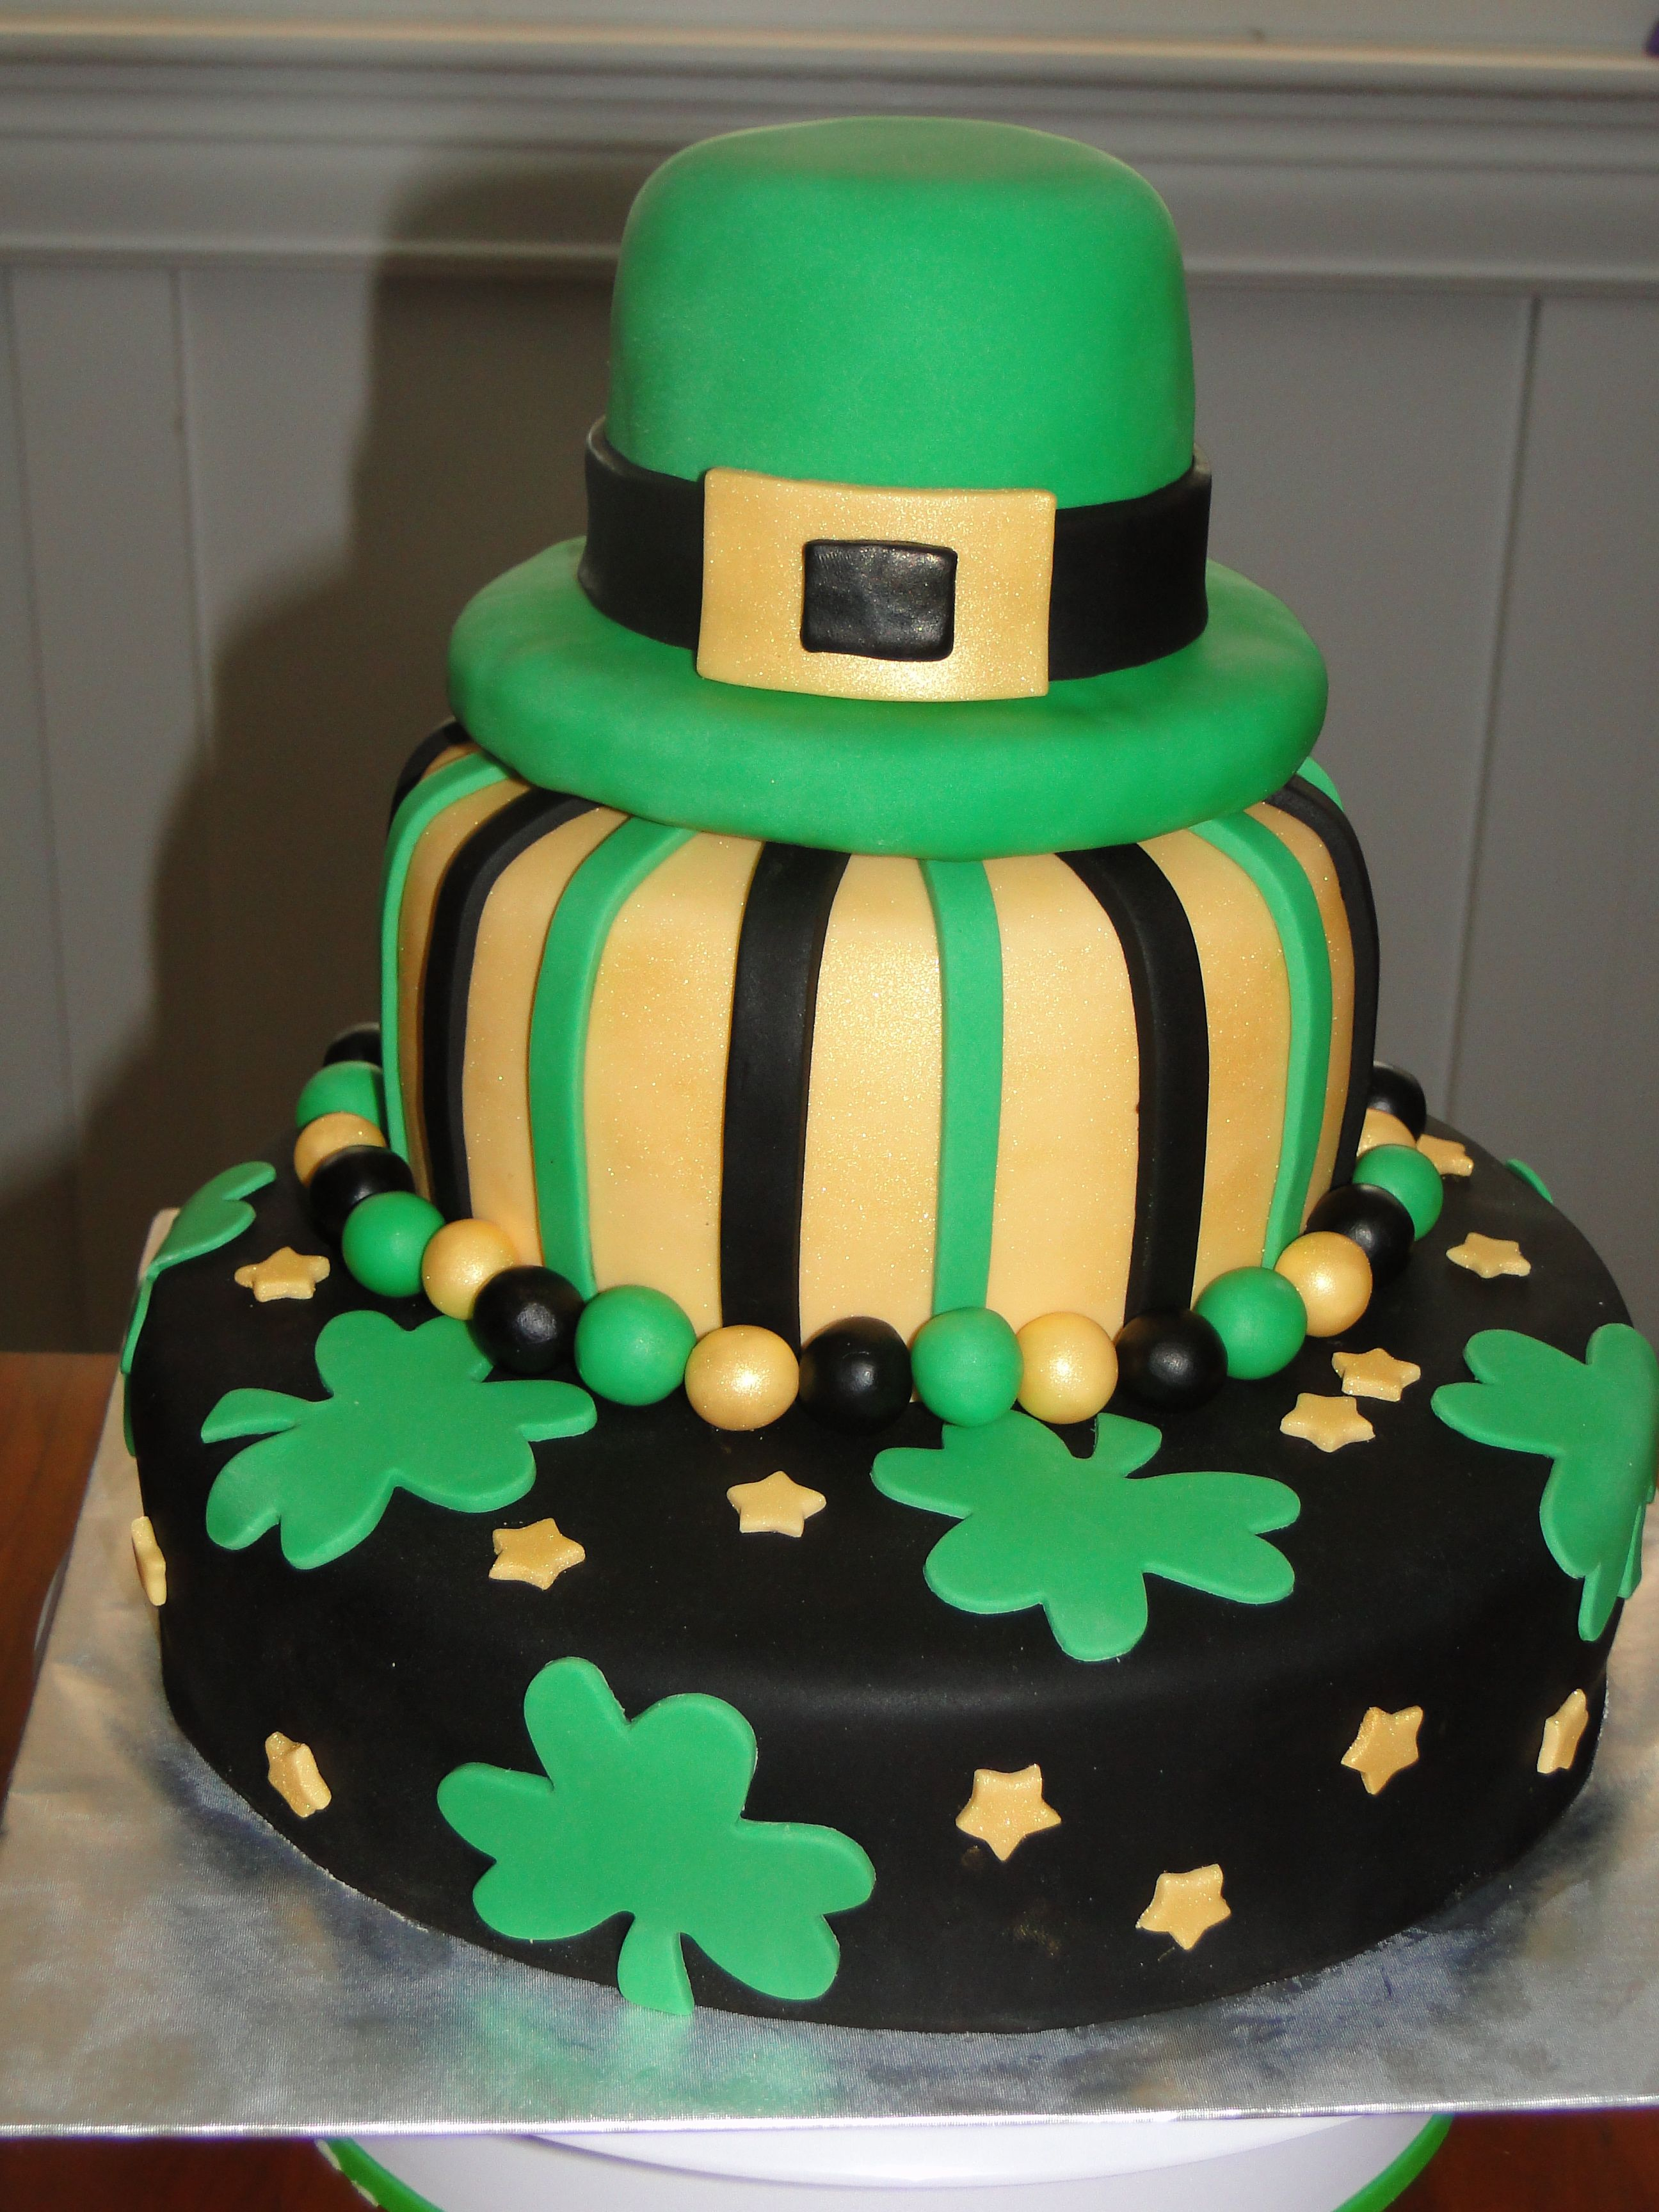 Wondrous Irish Birthday Cake St Patricks Day Cakes Irish Birthday Cake Cake Personalised Birthday Cards Veneteletsinfo